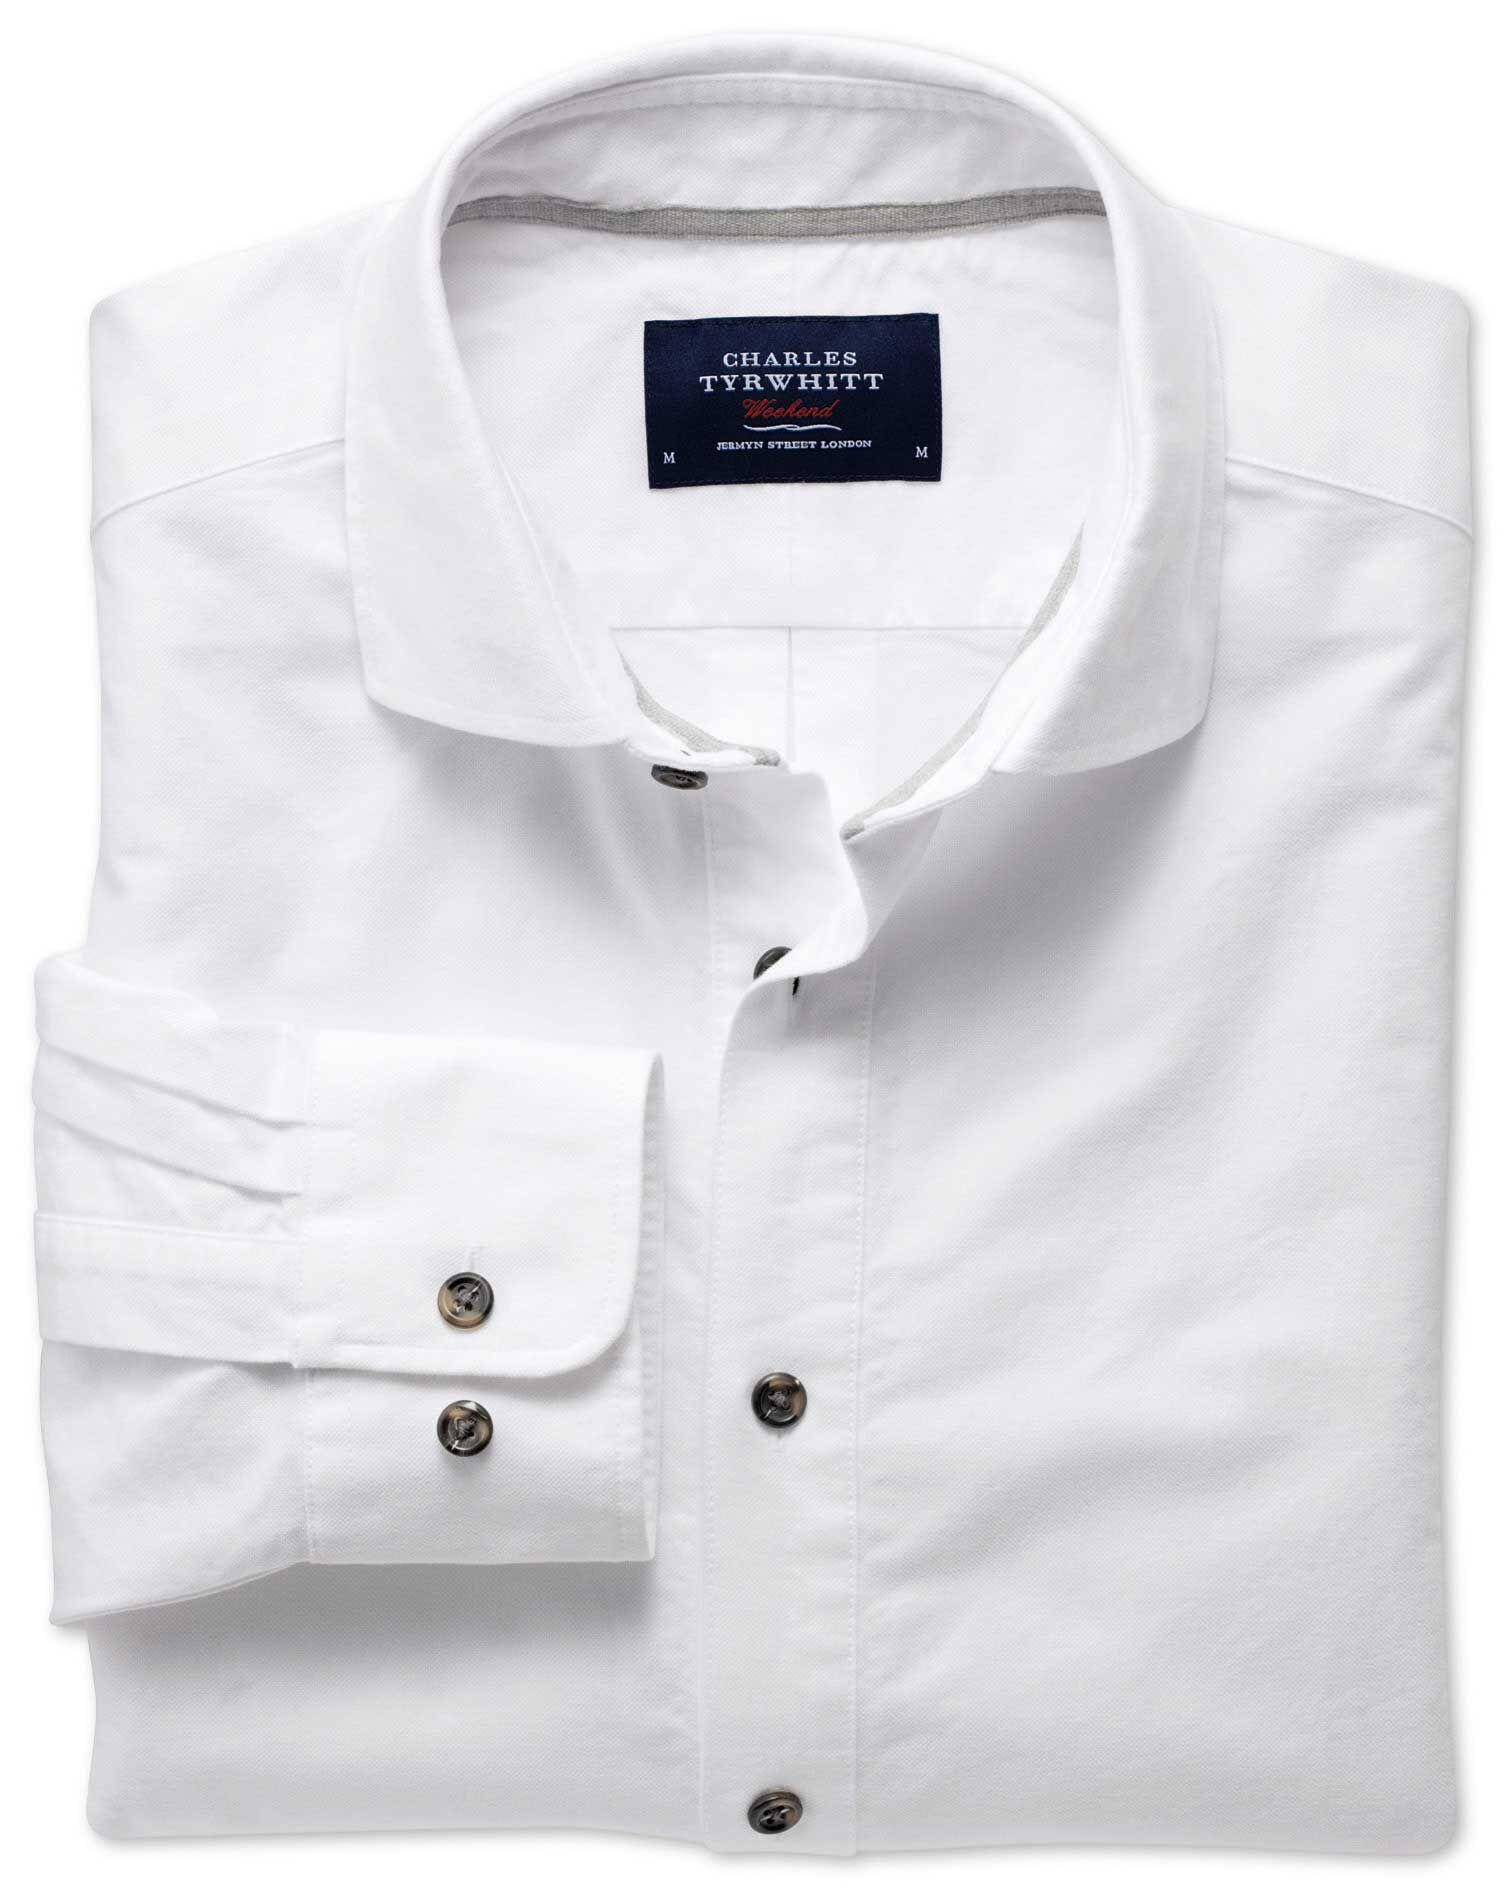 Slim Fit Cutaway Collar Popover White Cotton Shirt Single Cuff Size XL by Charles Tyrwhitt